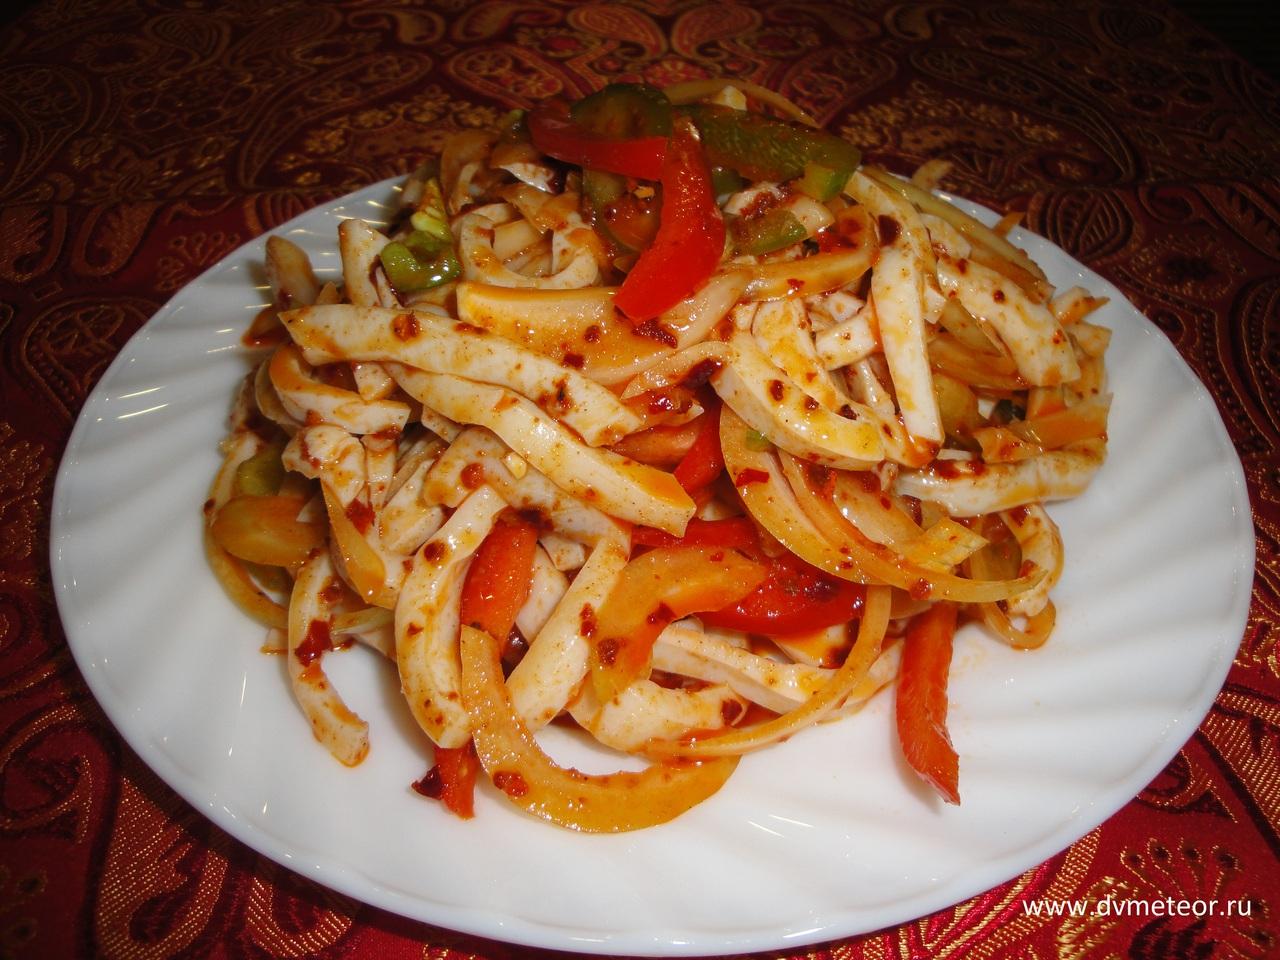 Салат с кальмаром рецепт с фото пошагово 80